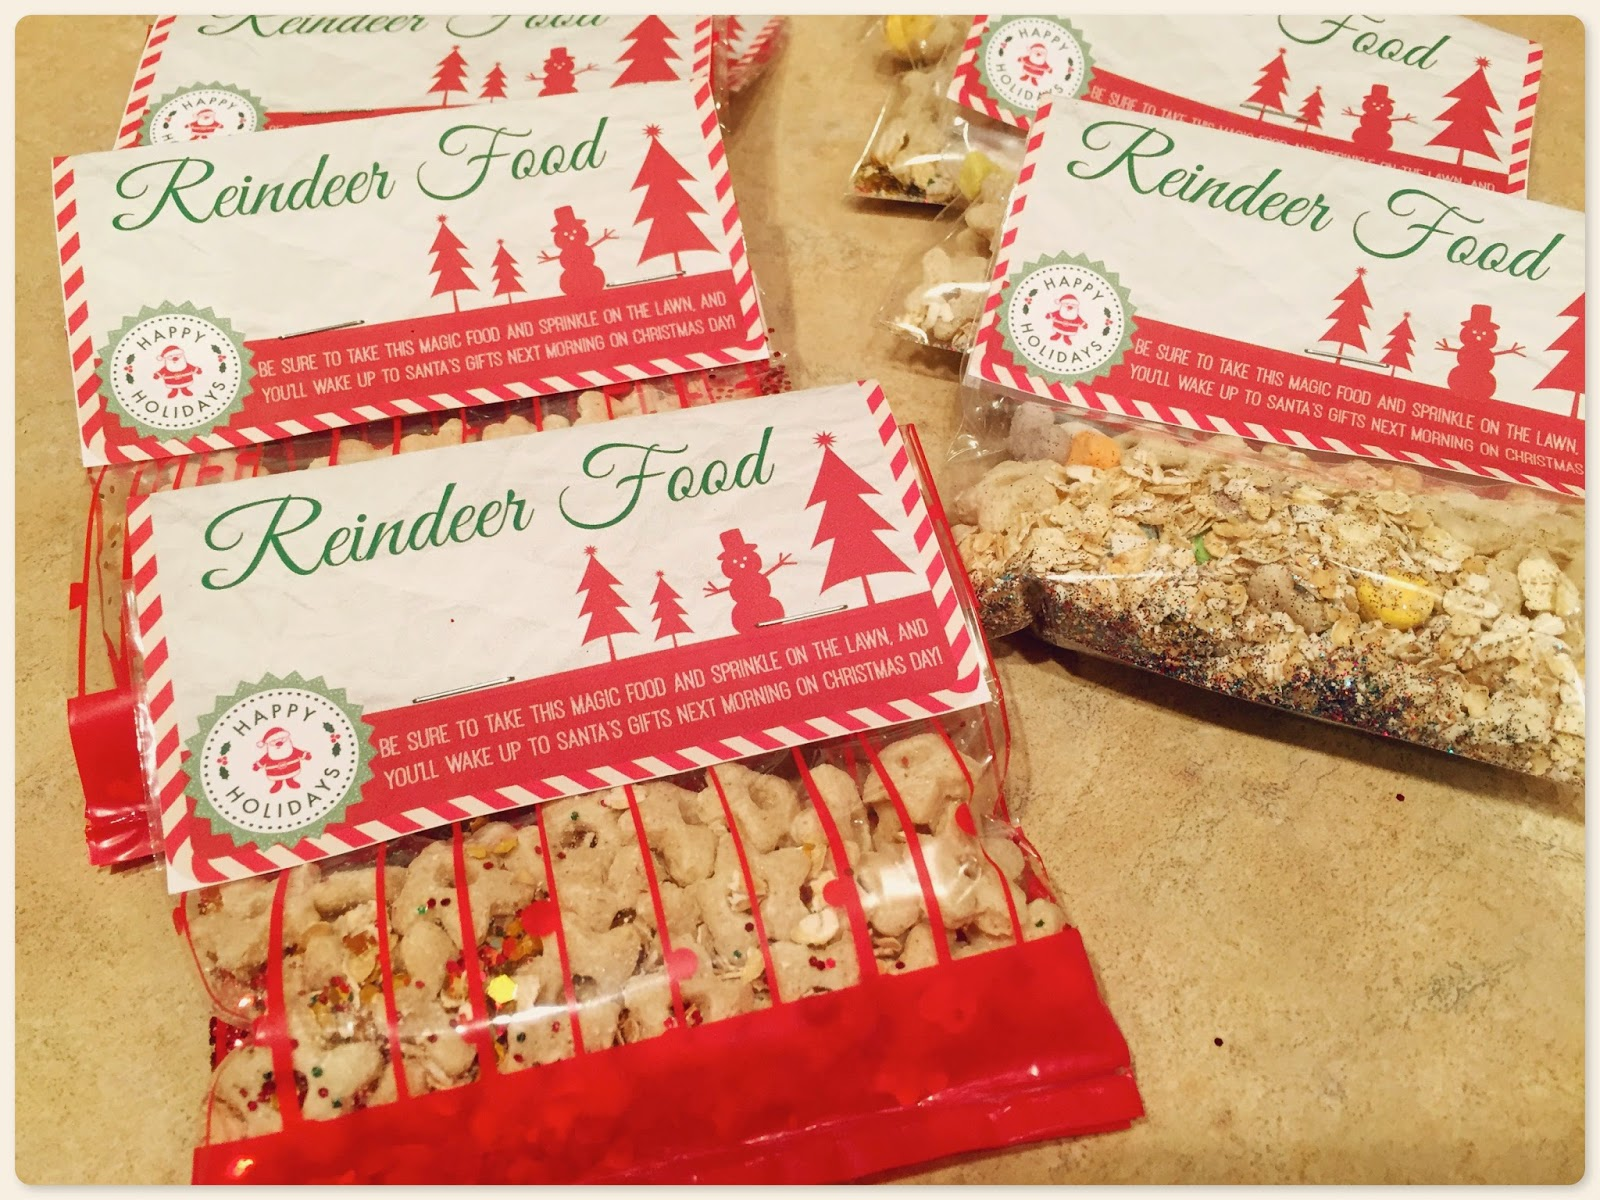 Taylors4you Reindeer Food With Free Printable Label